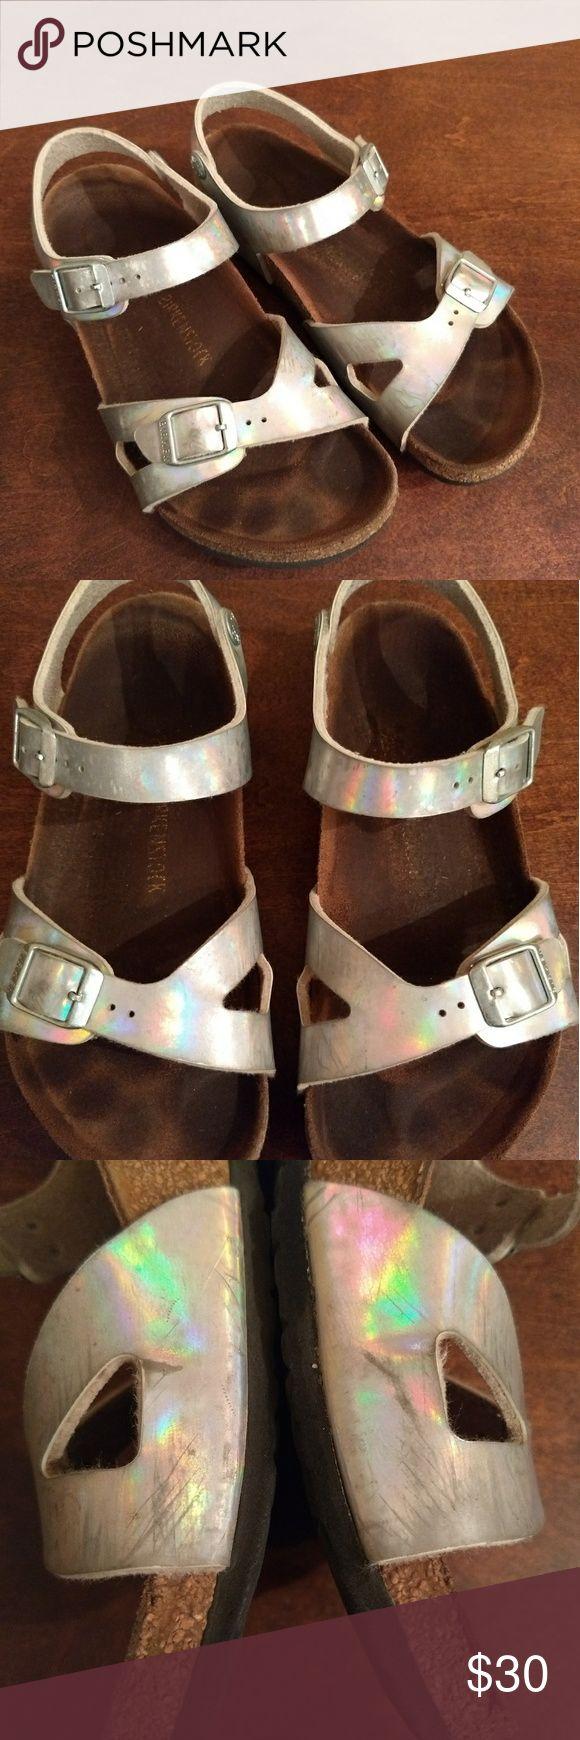 Birkenstock Sandals Girls Birkenstocks Silver holographic Hard to find size! 34 or US 3 or 4 Has markings on shoes so check out pictures Birkenstock Shoes Sandals & Flip Flops